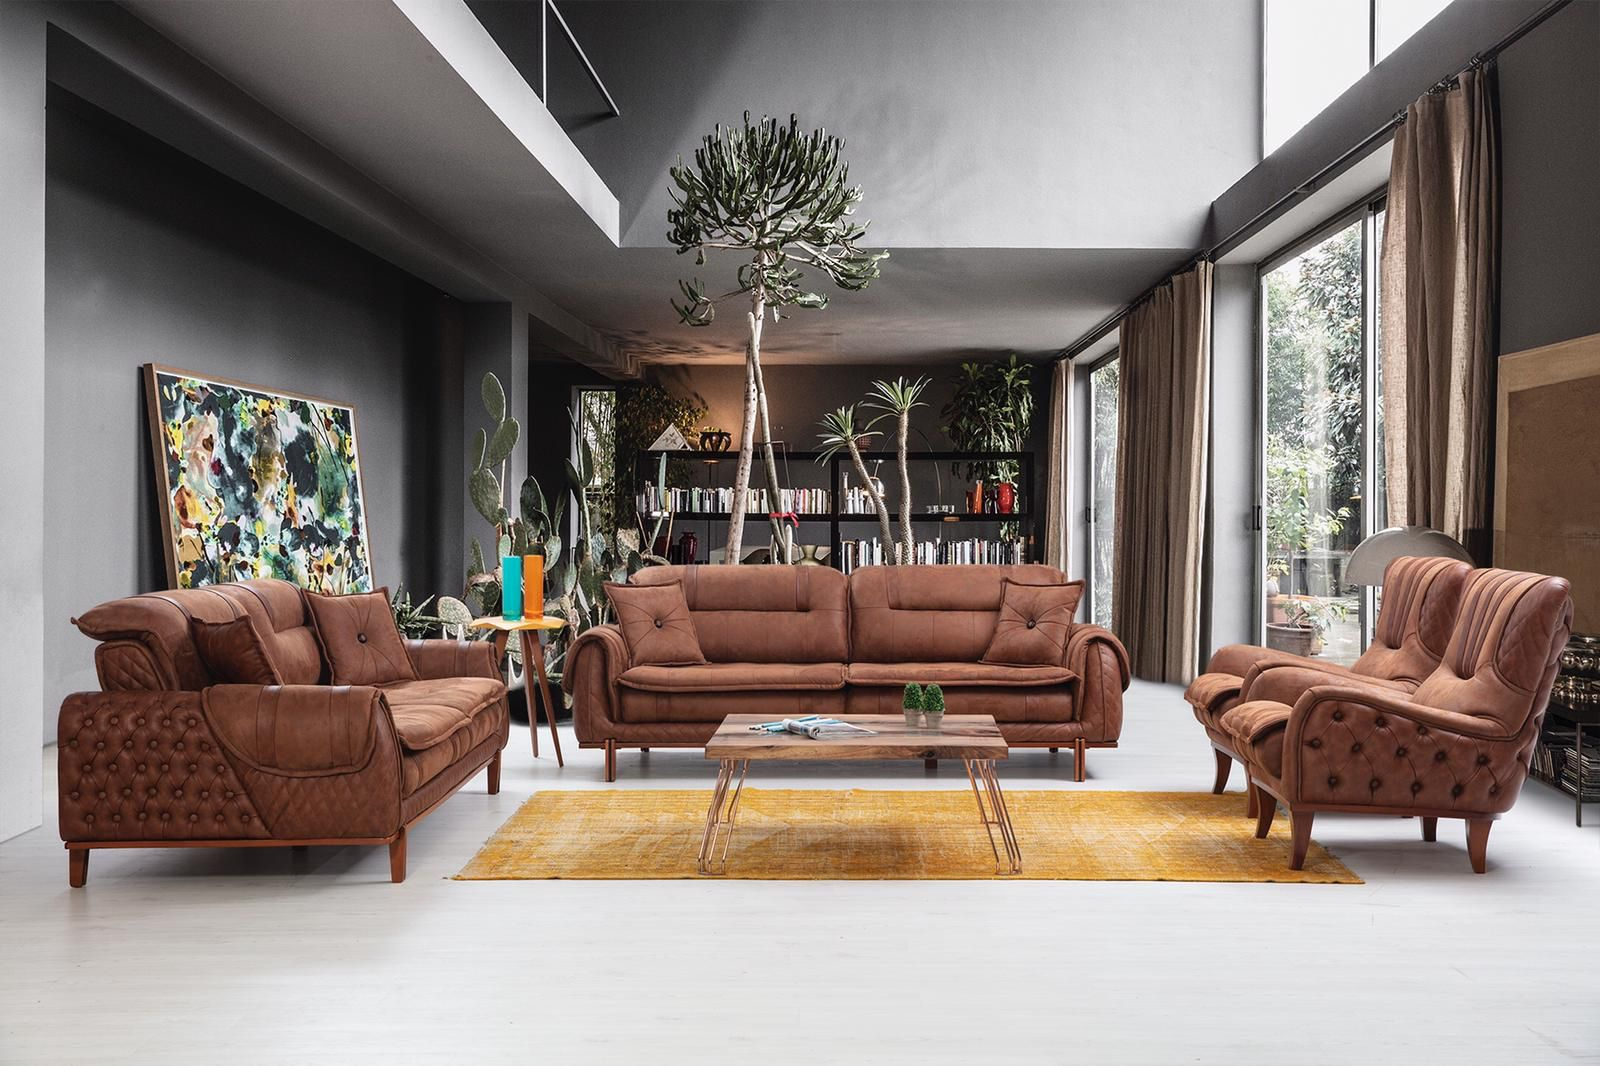 Pin By Hasan Keskin On Koltuklar Home Decor Furniture Furniture Design